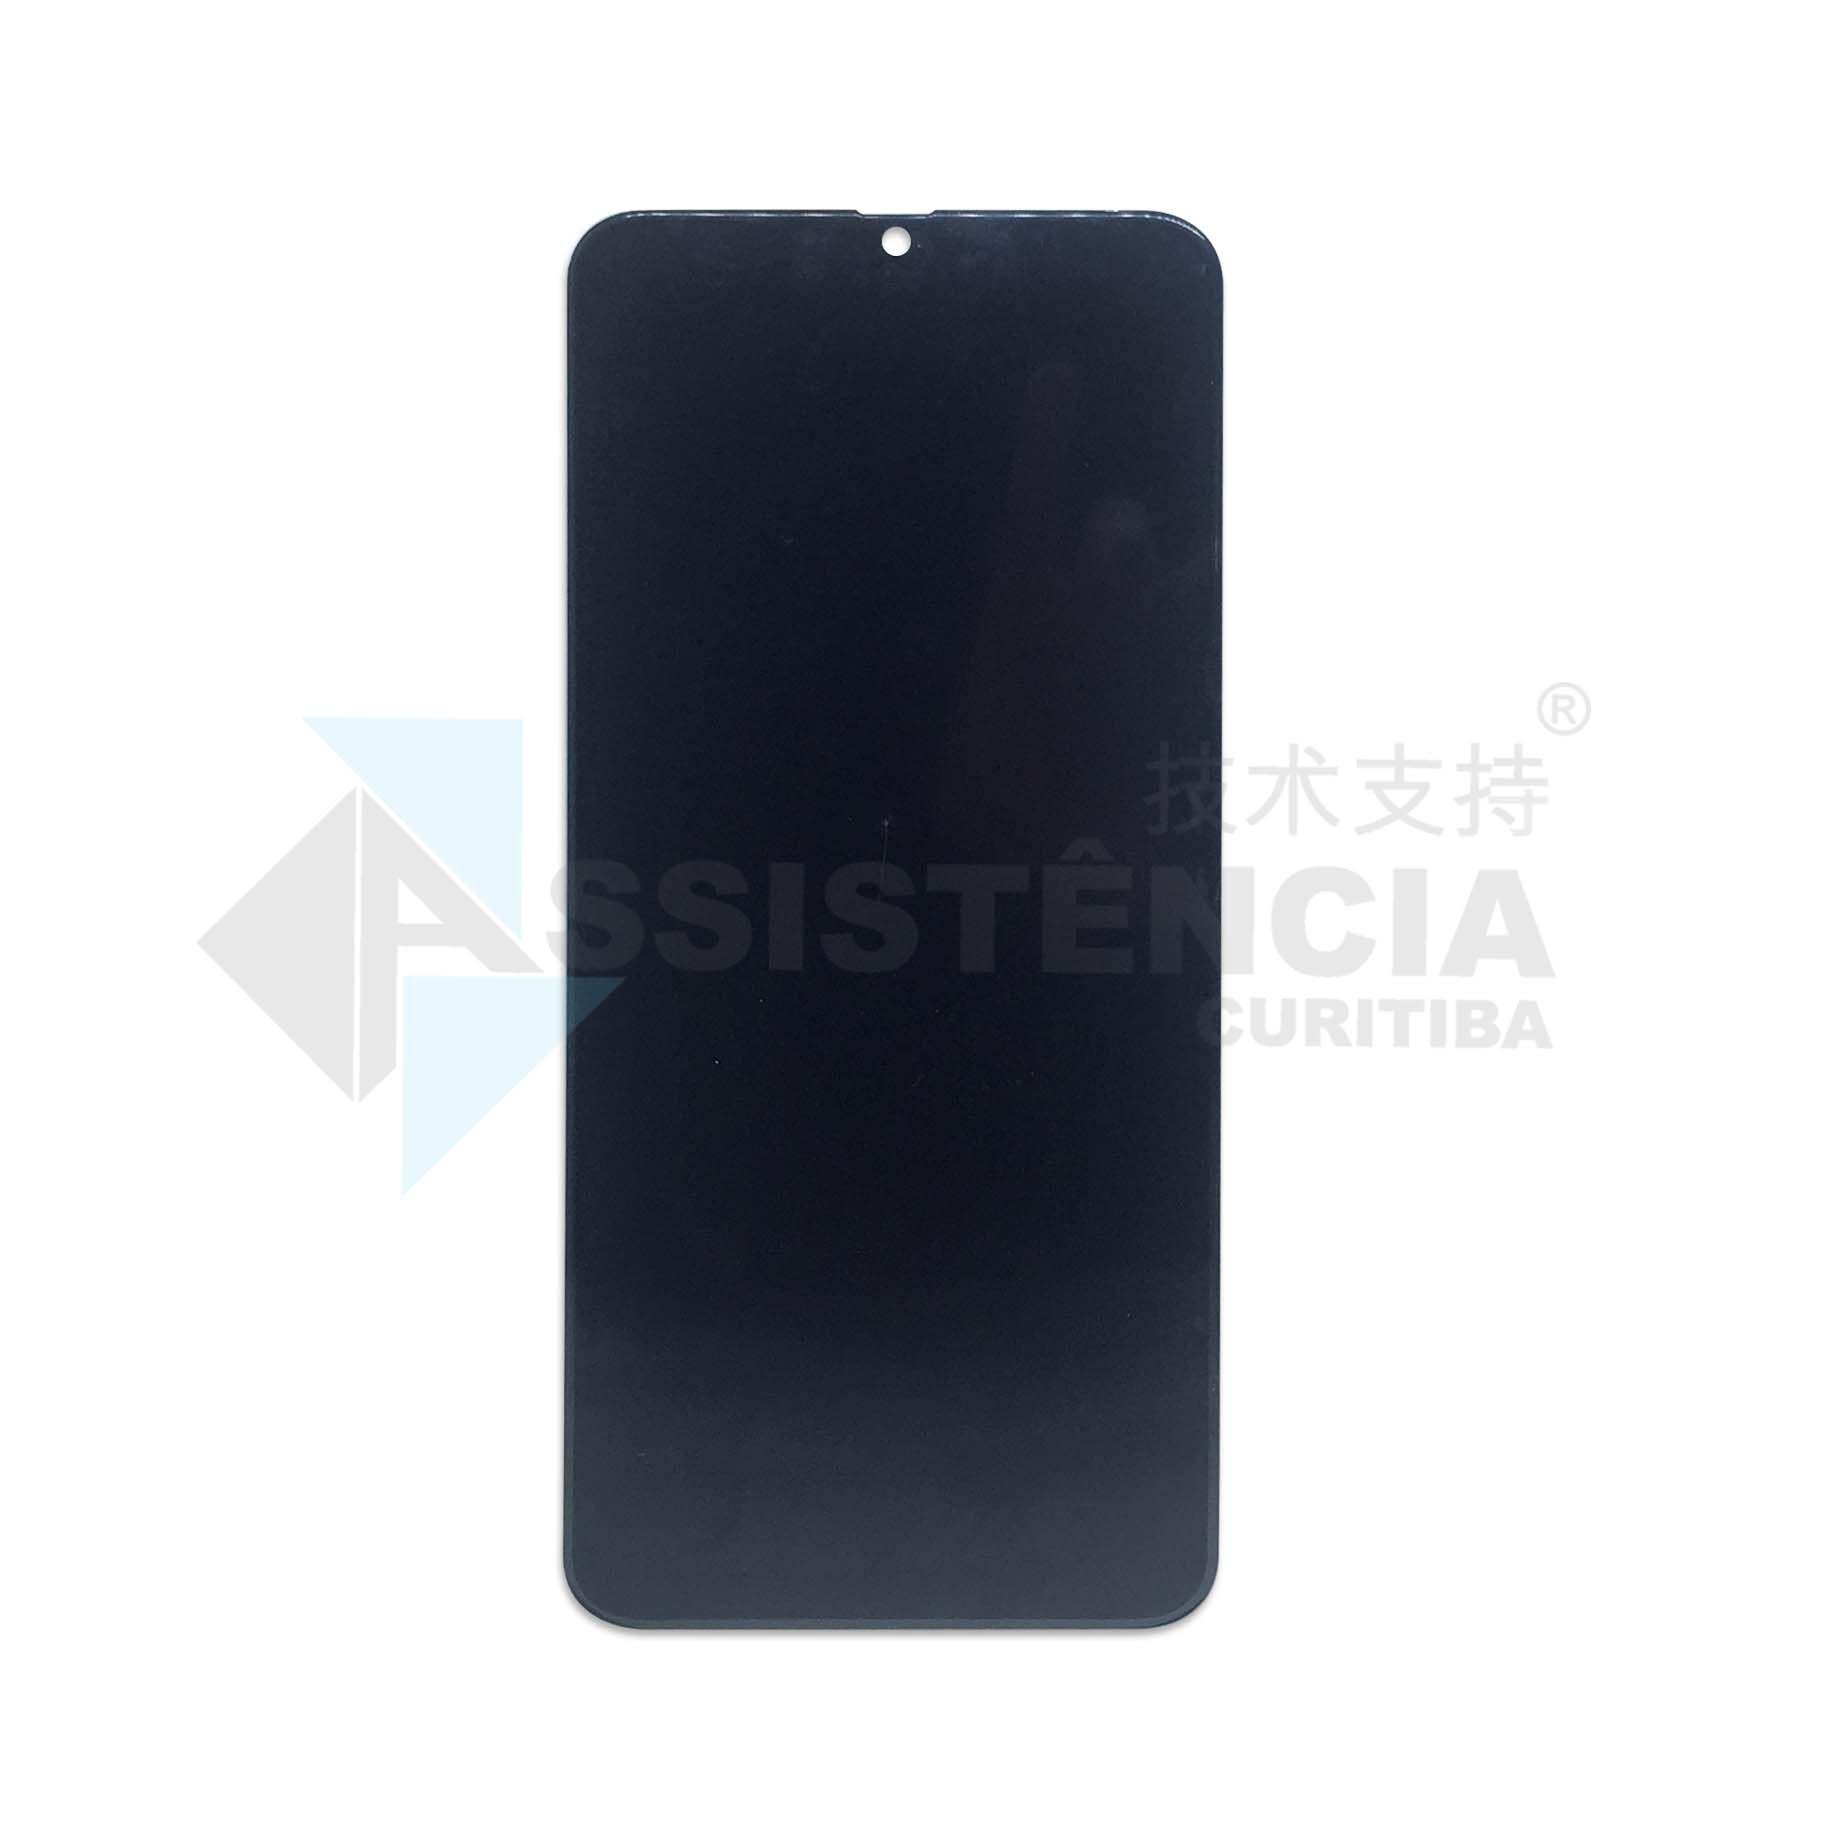 Tela Display Samsung Galaxy A30 A305 Original China